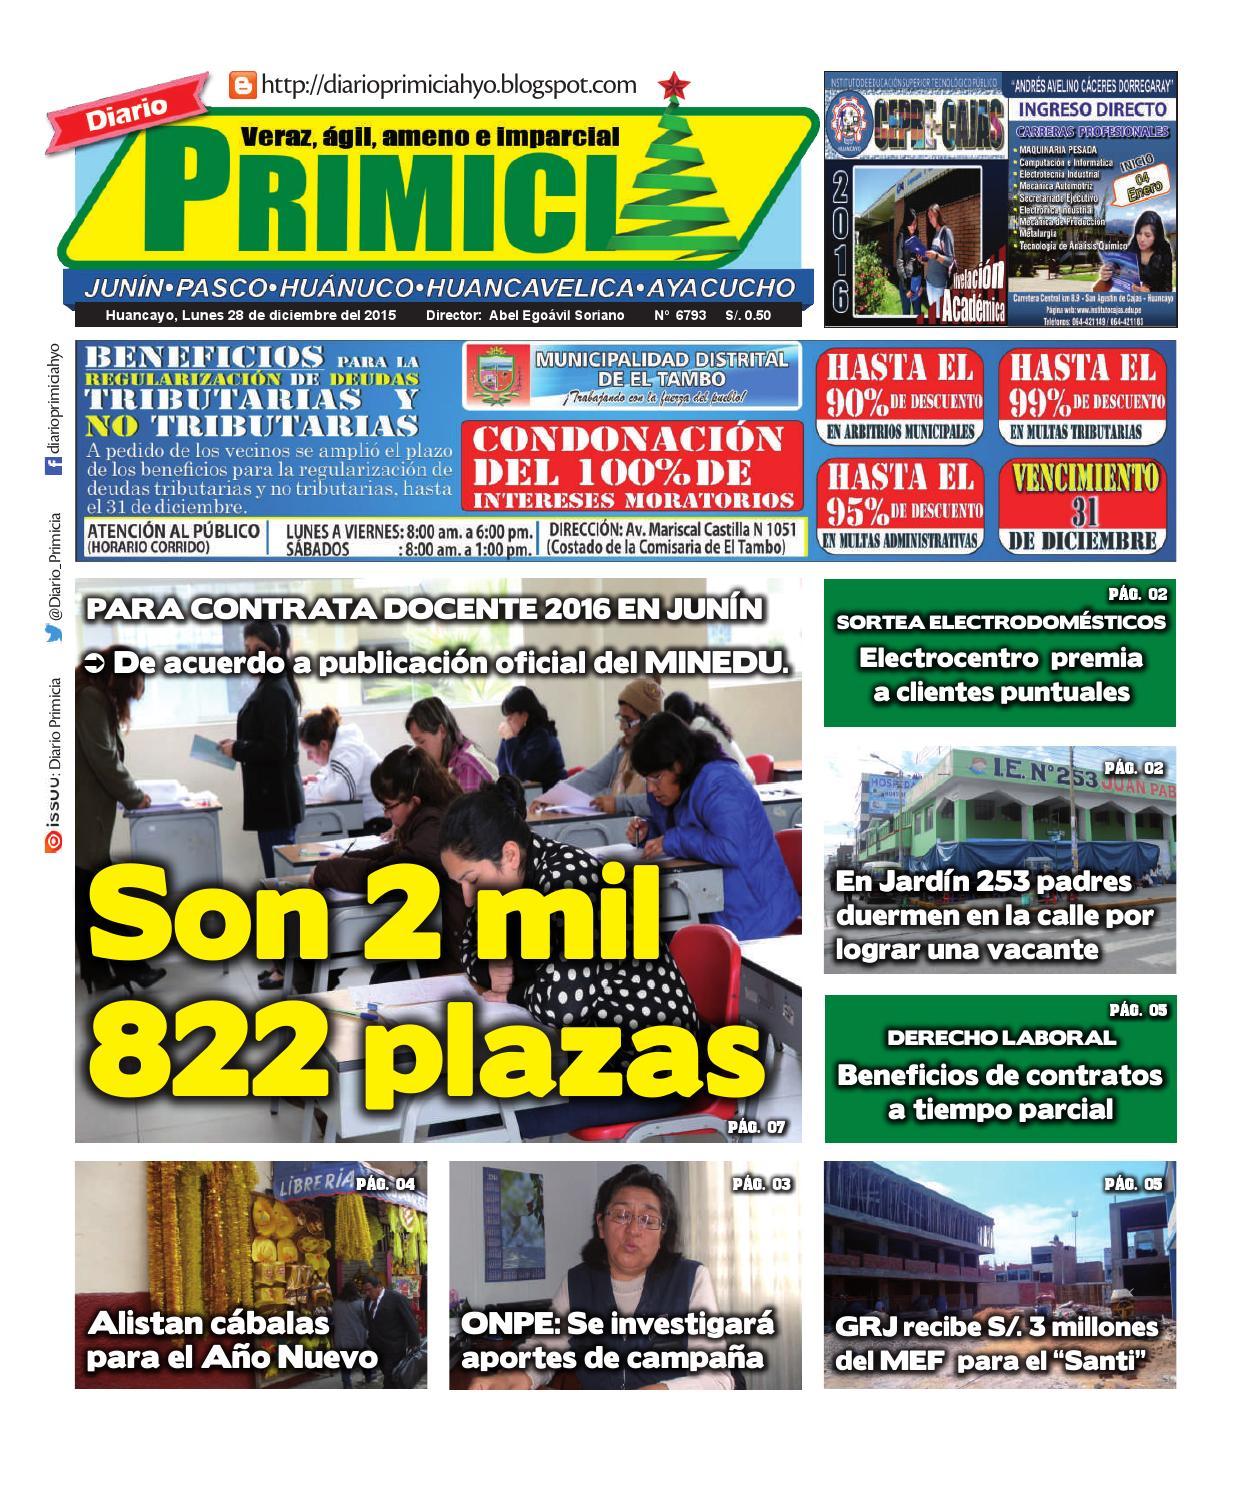 Diario primicia huancayo 28 12 15 by diario primicia issuu for Vacantes jardin 2016